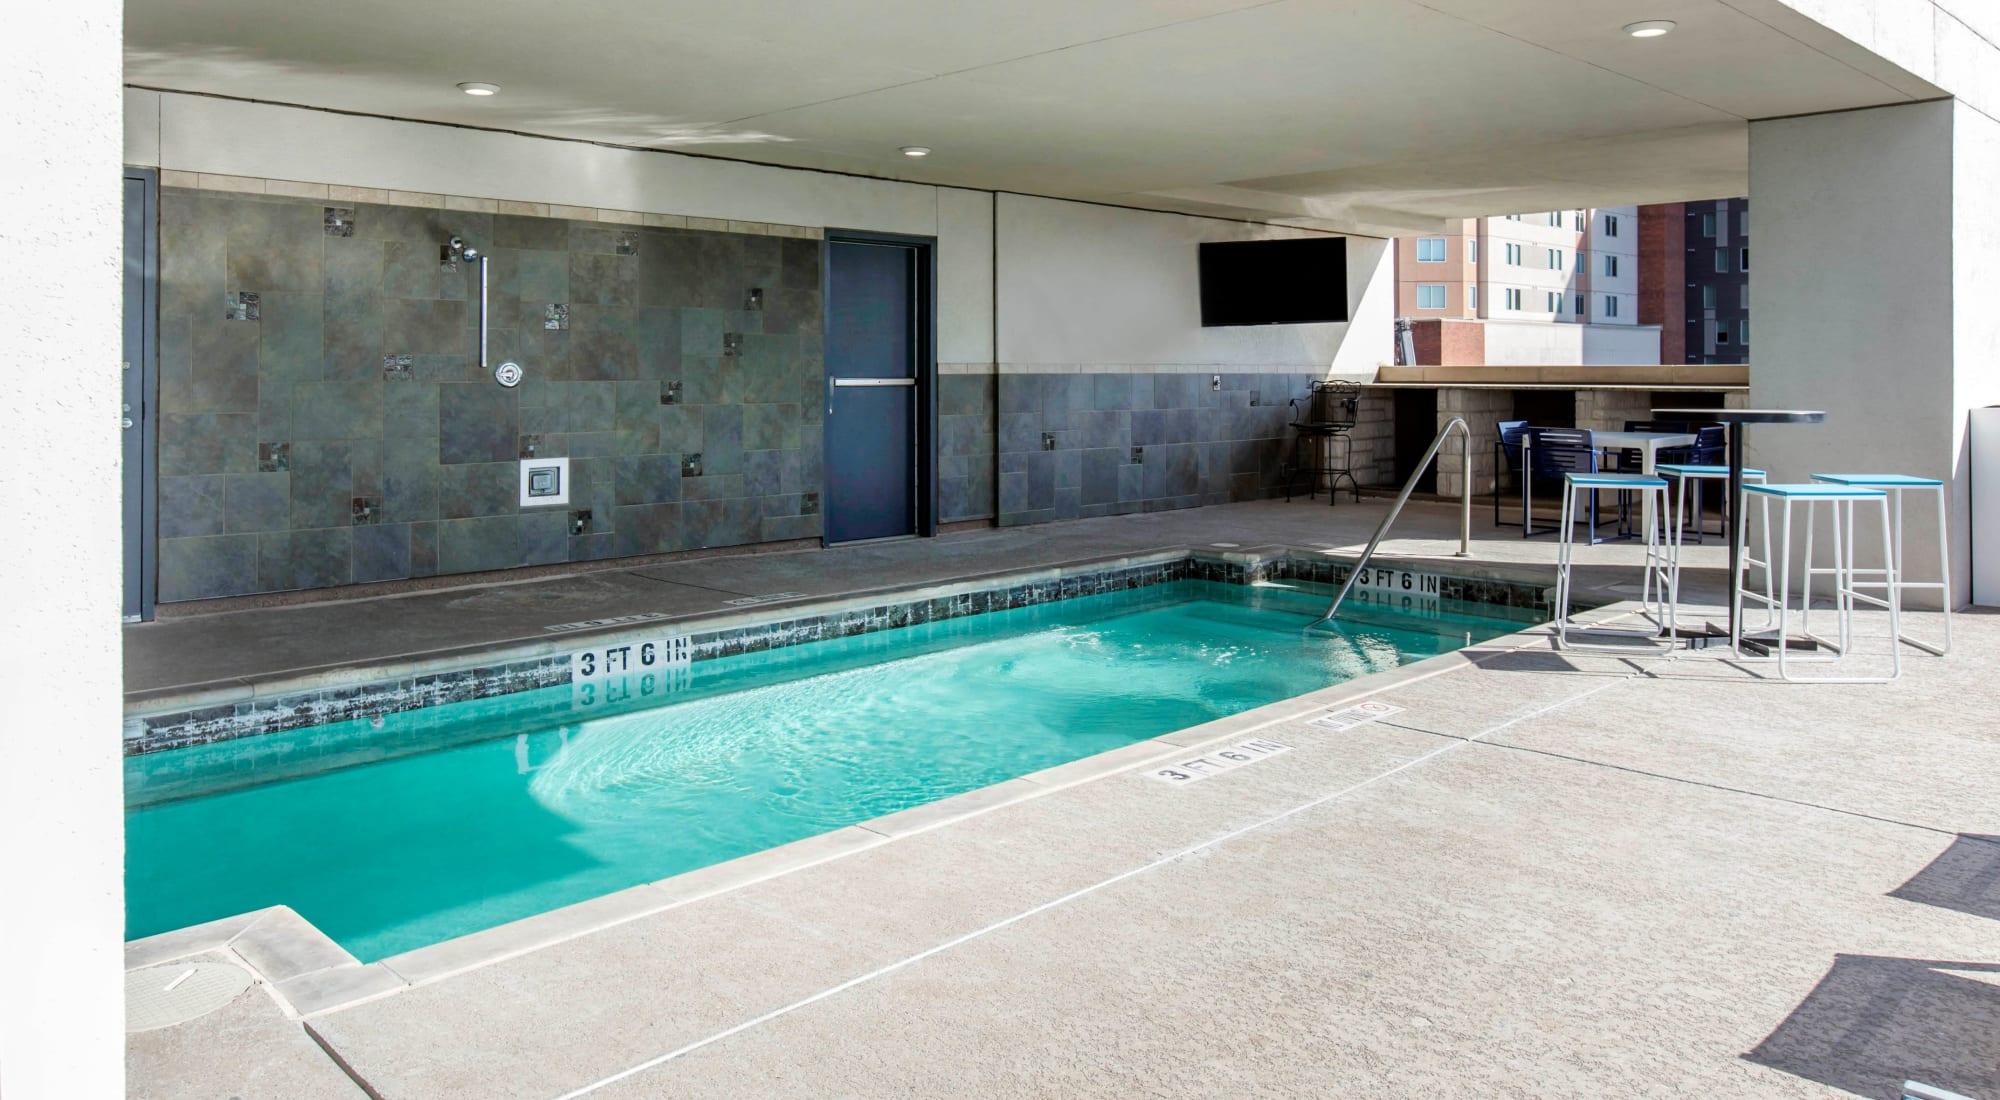 Apartments at 21 Rio in Austin, Texas